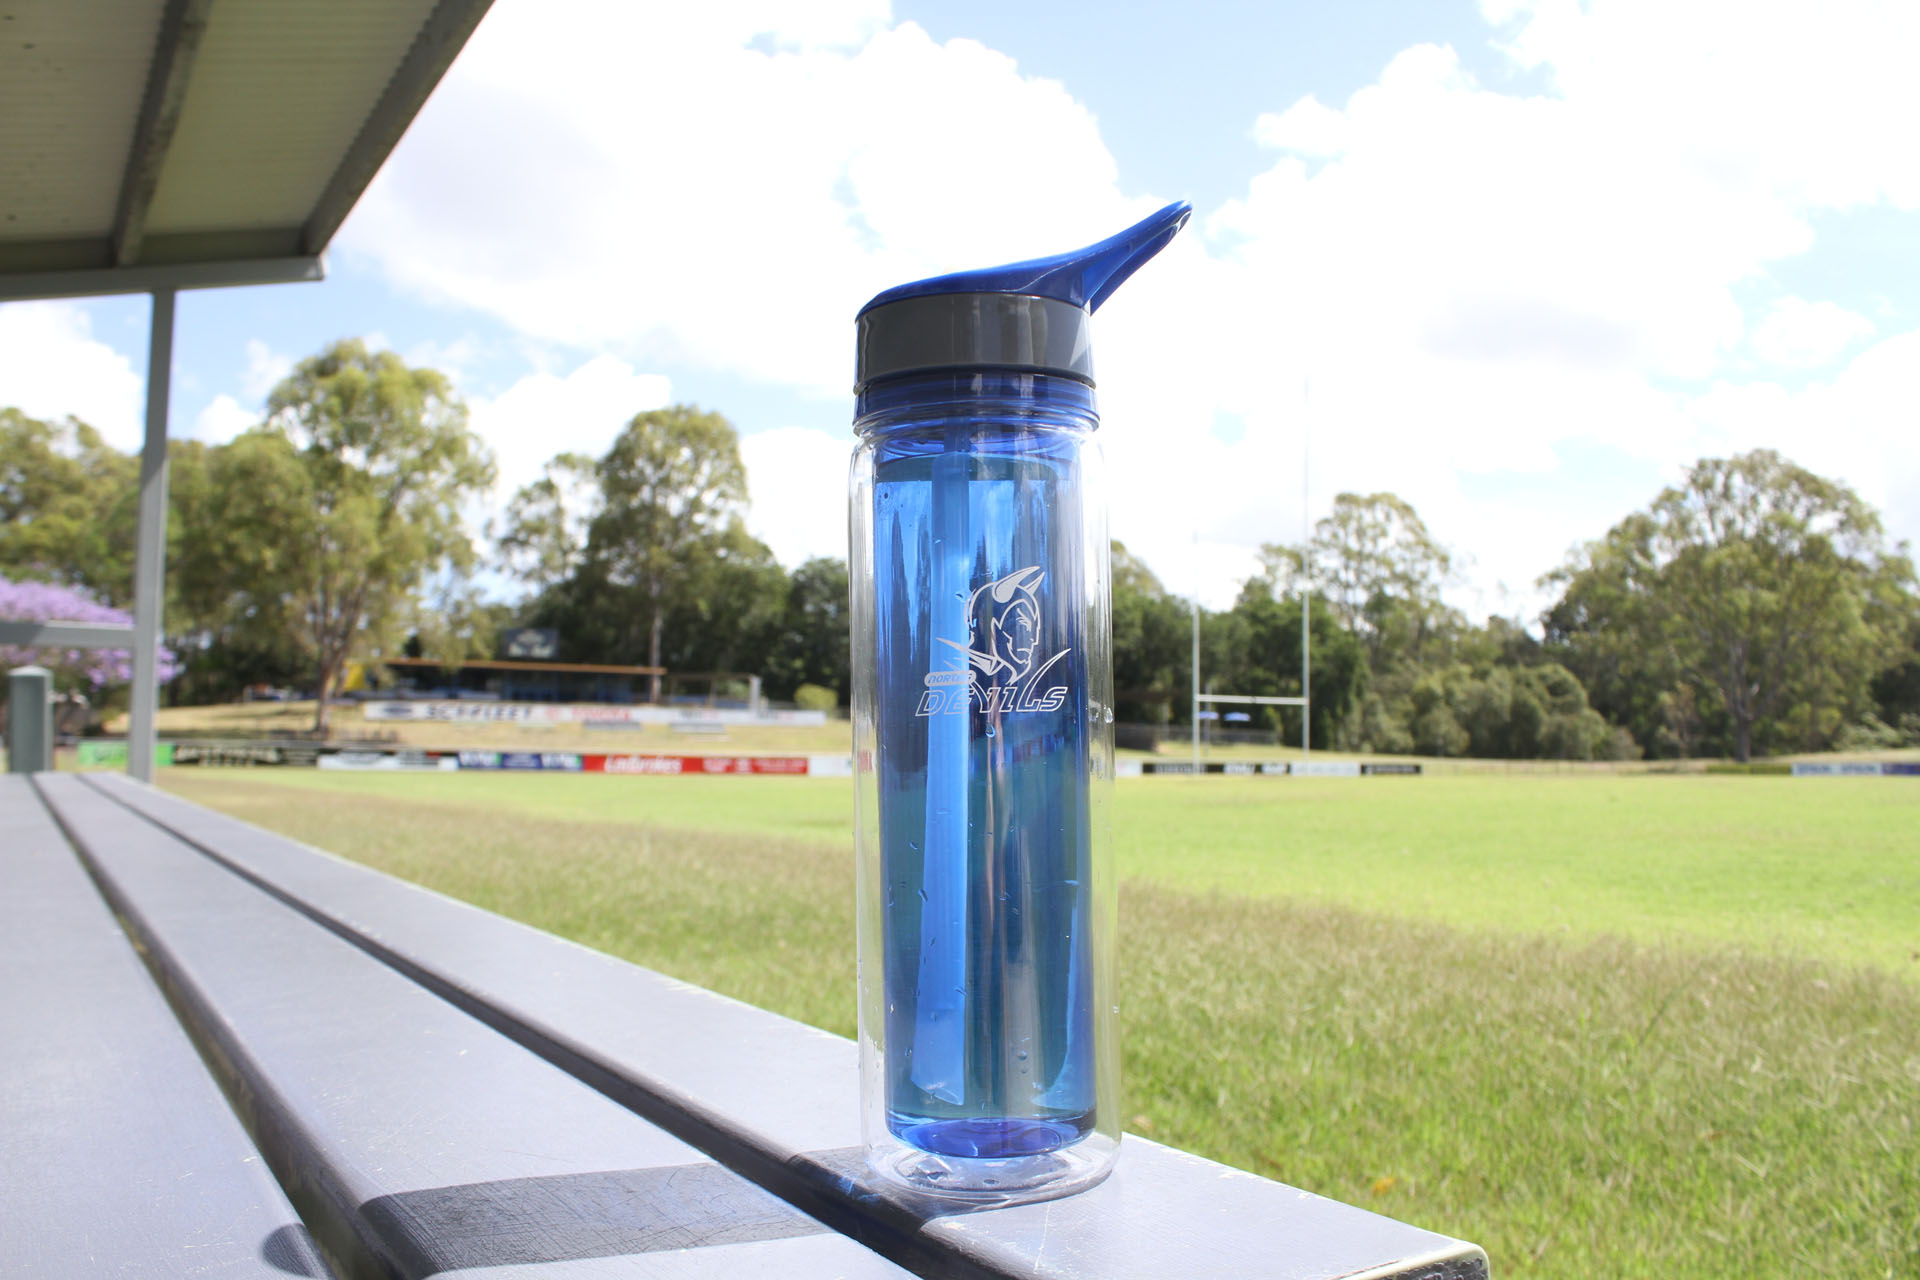 Norths Devils drink bottle now available